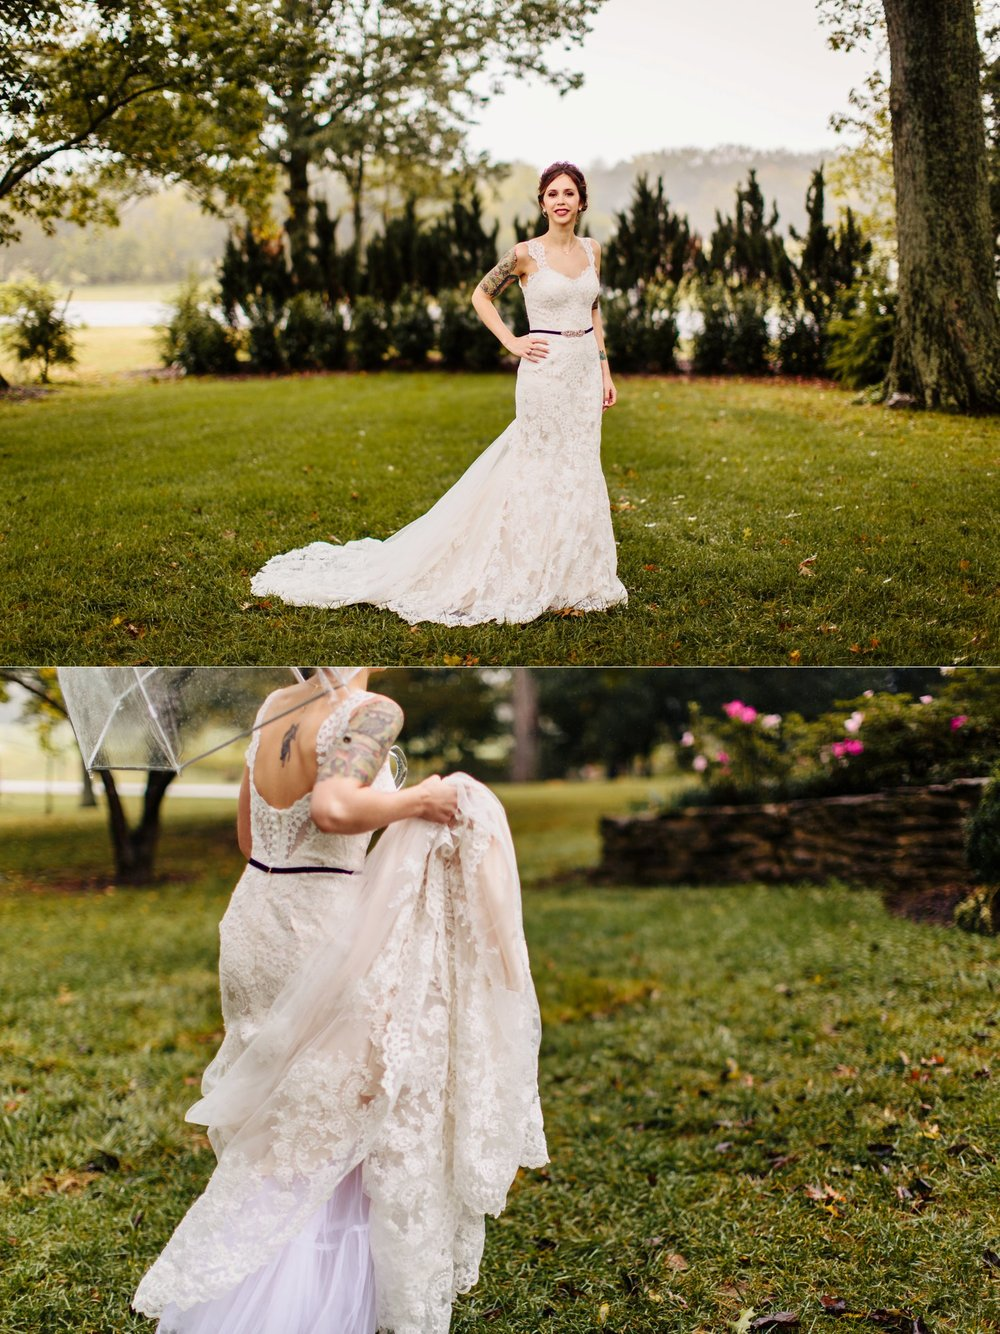 CK-Photo-arrington-wedding_0008.jpg